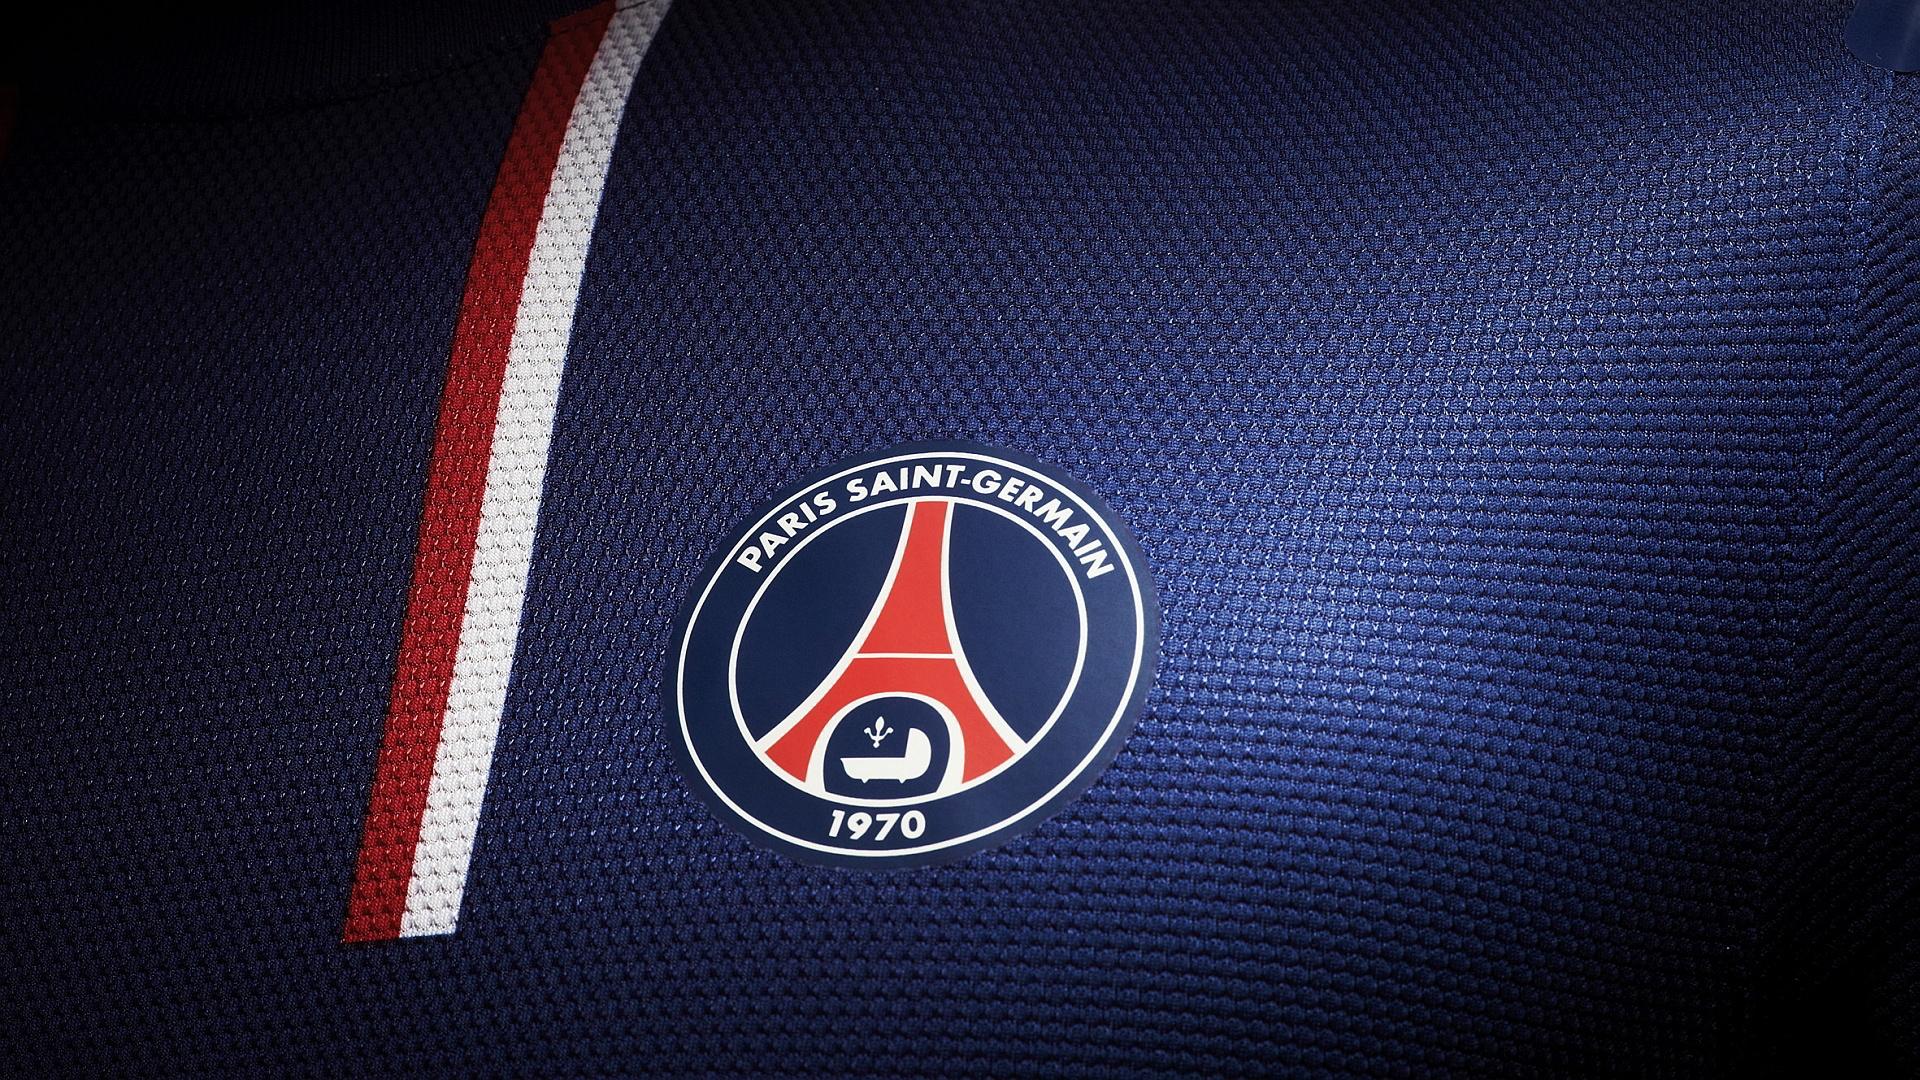 Logo Circle Brand Clothing Paris Saint Germain Symbol Font Trademark Football Club